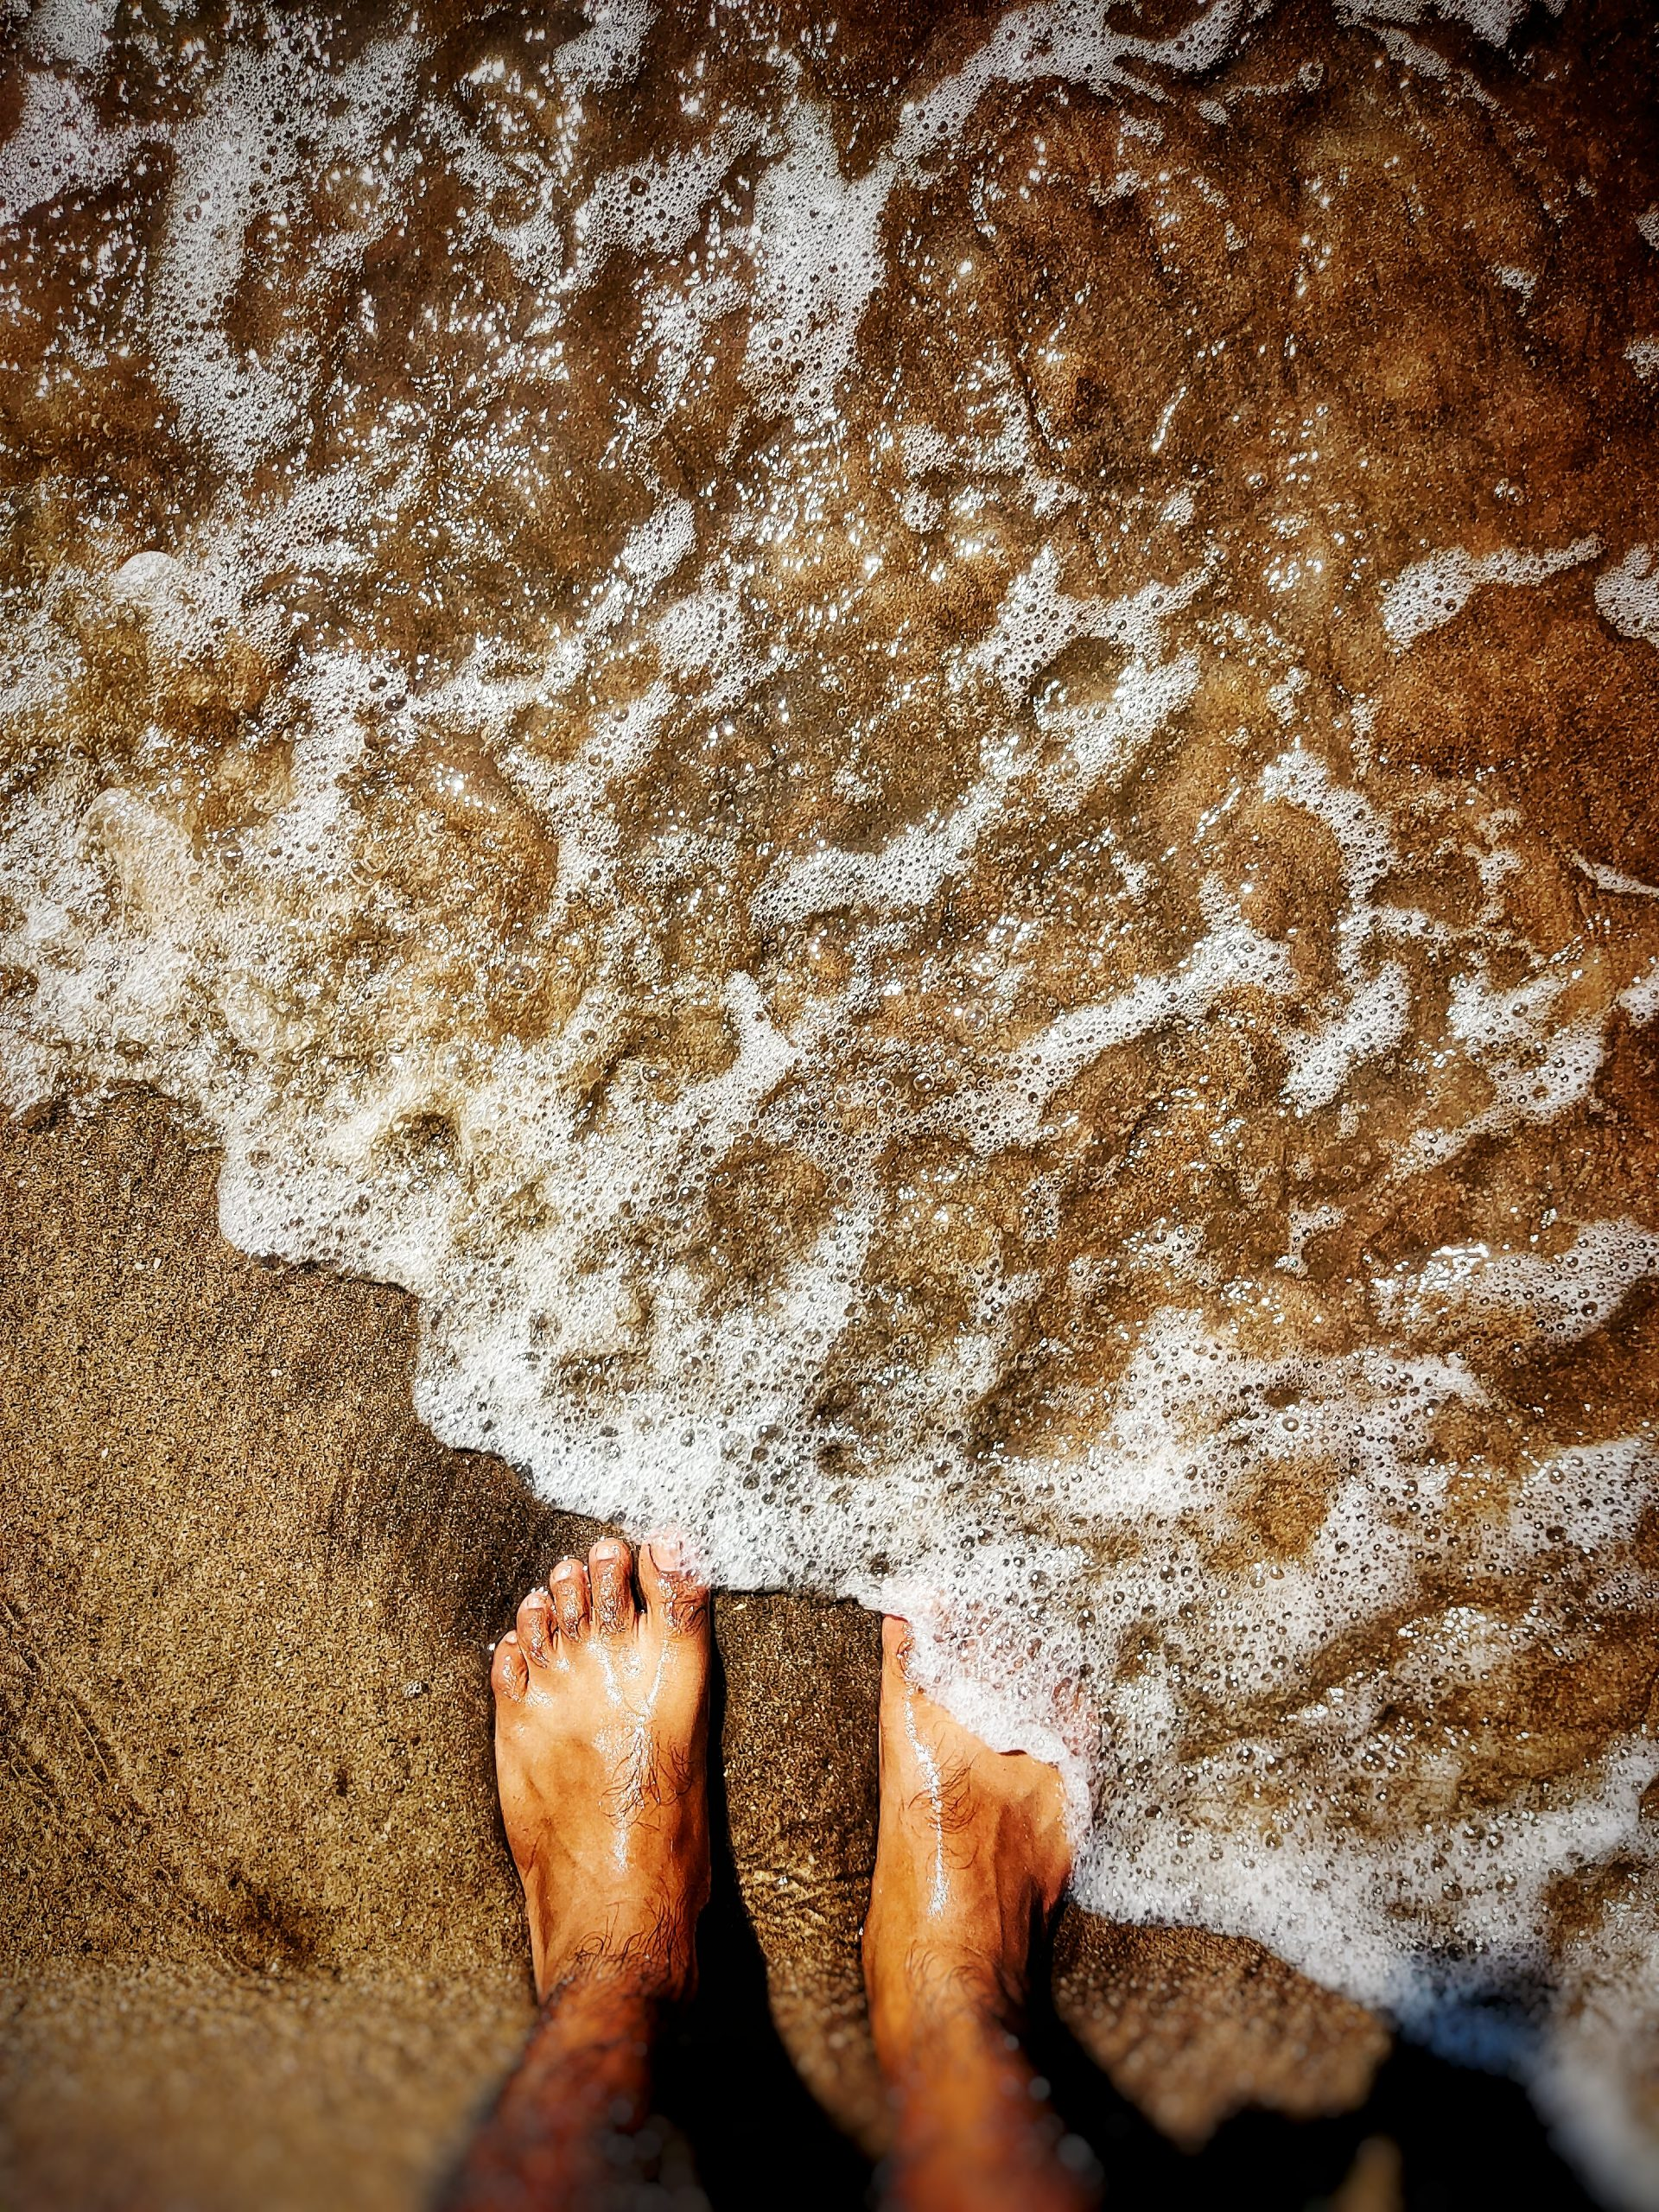 Beach water splashing on a mans feet